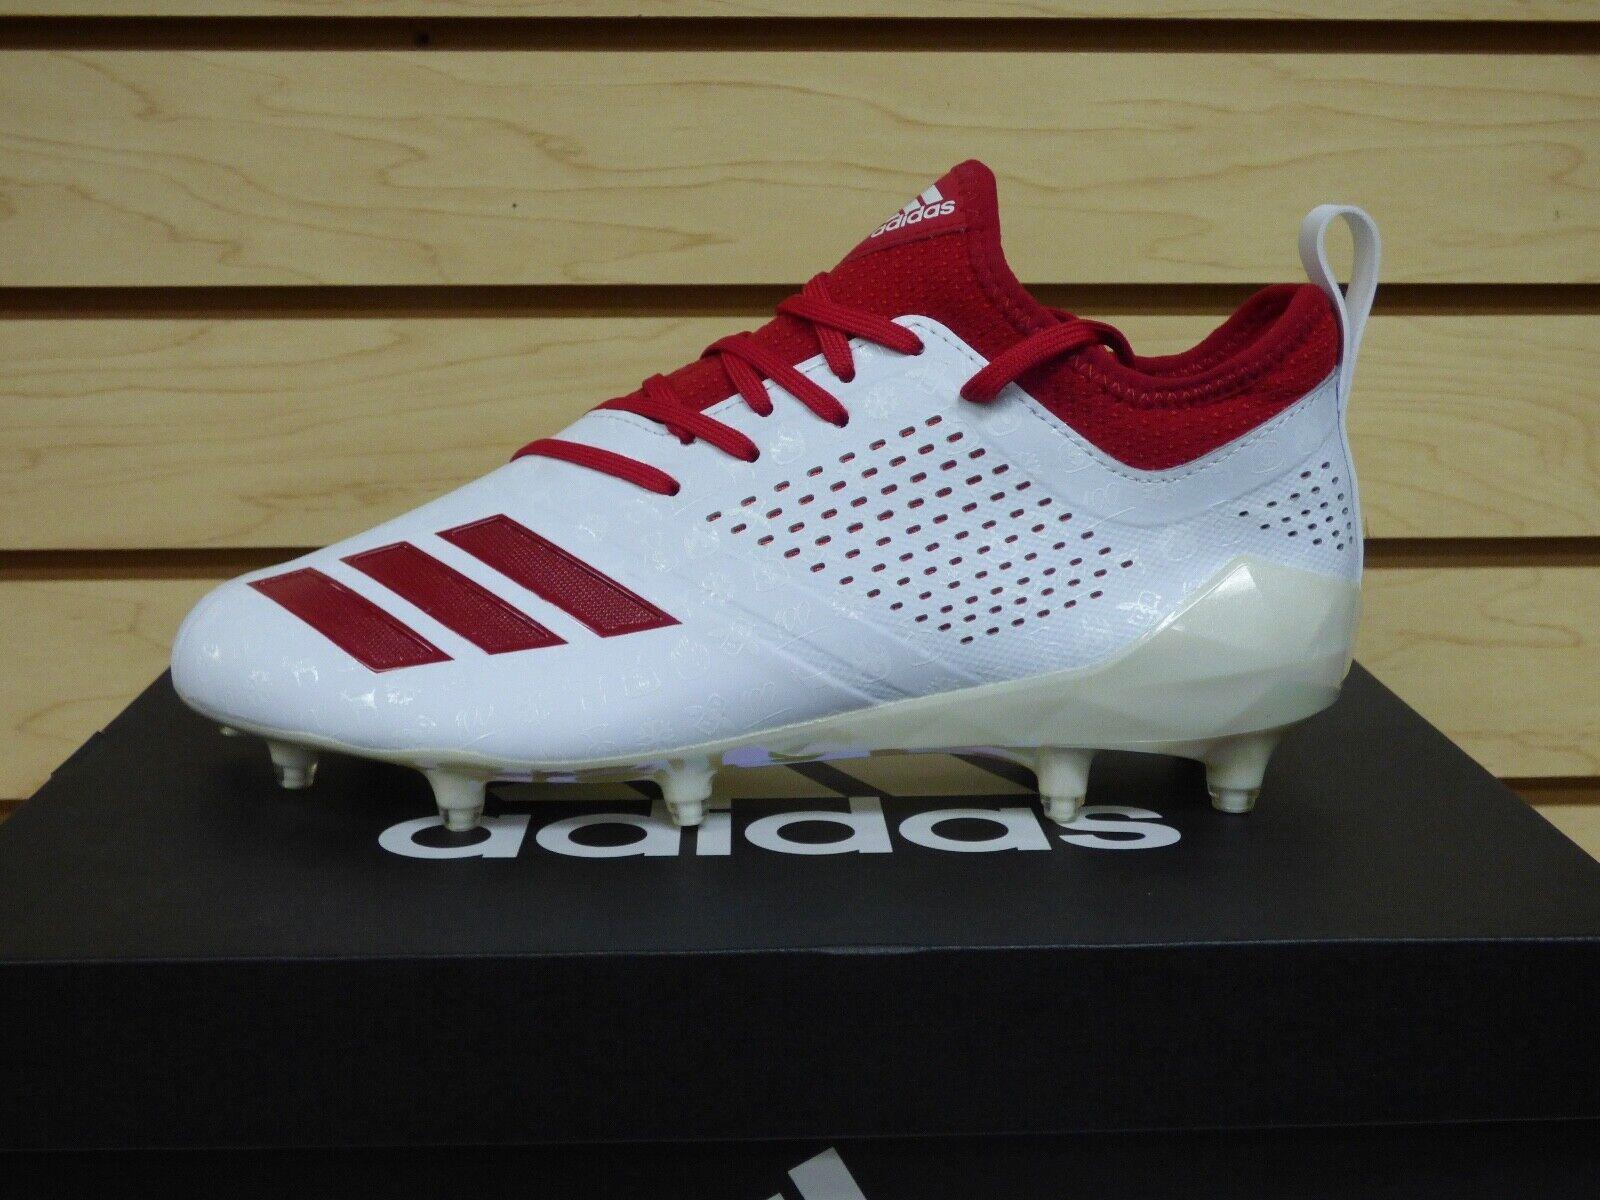 Star 7.0 Adimoji Football Cleats Red